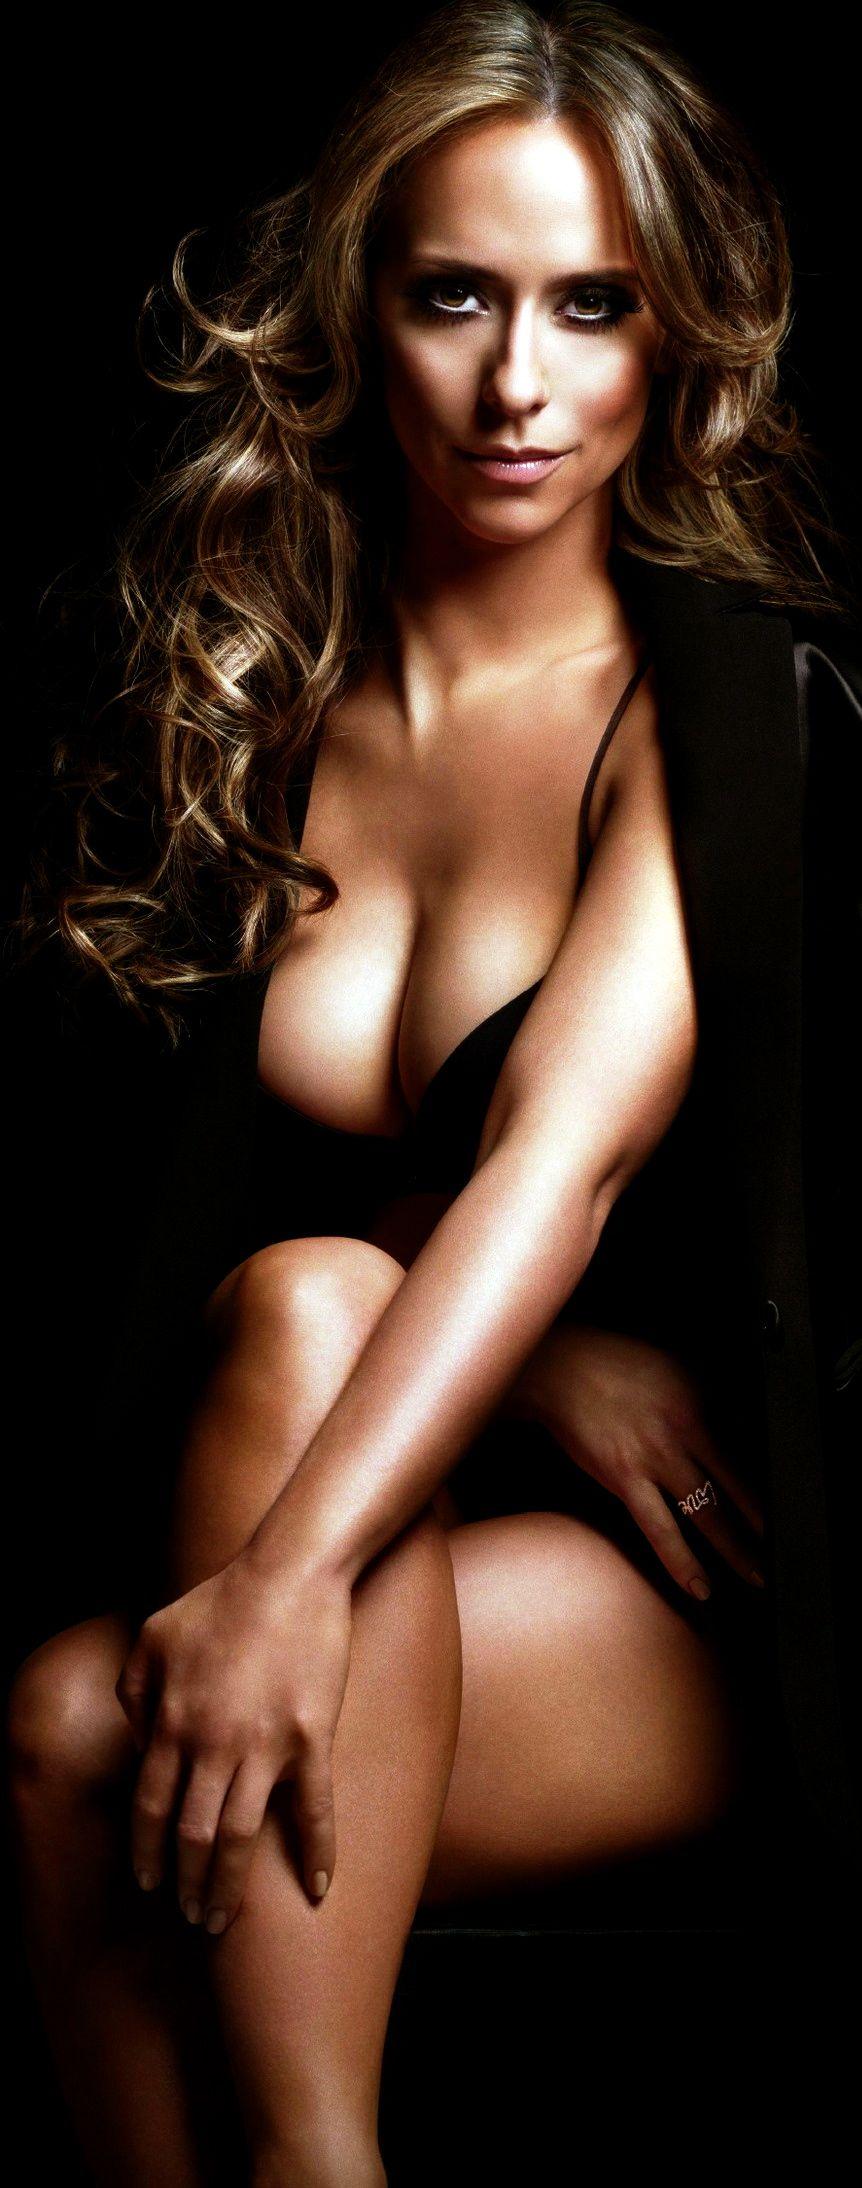 Jennifer aime hewette nue